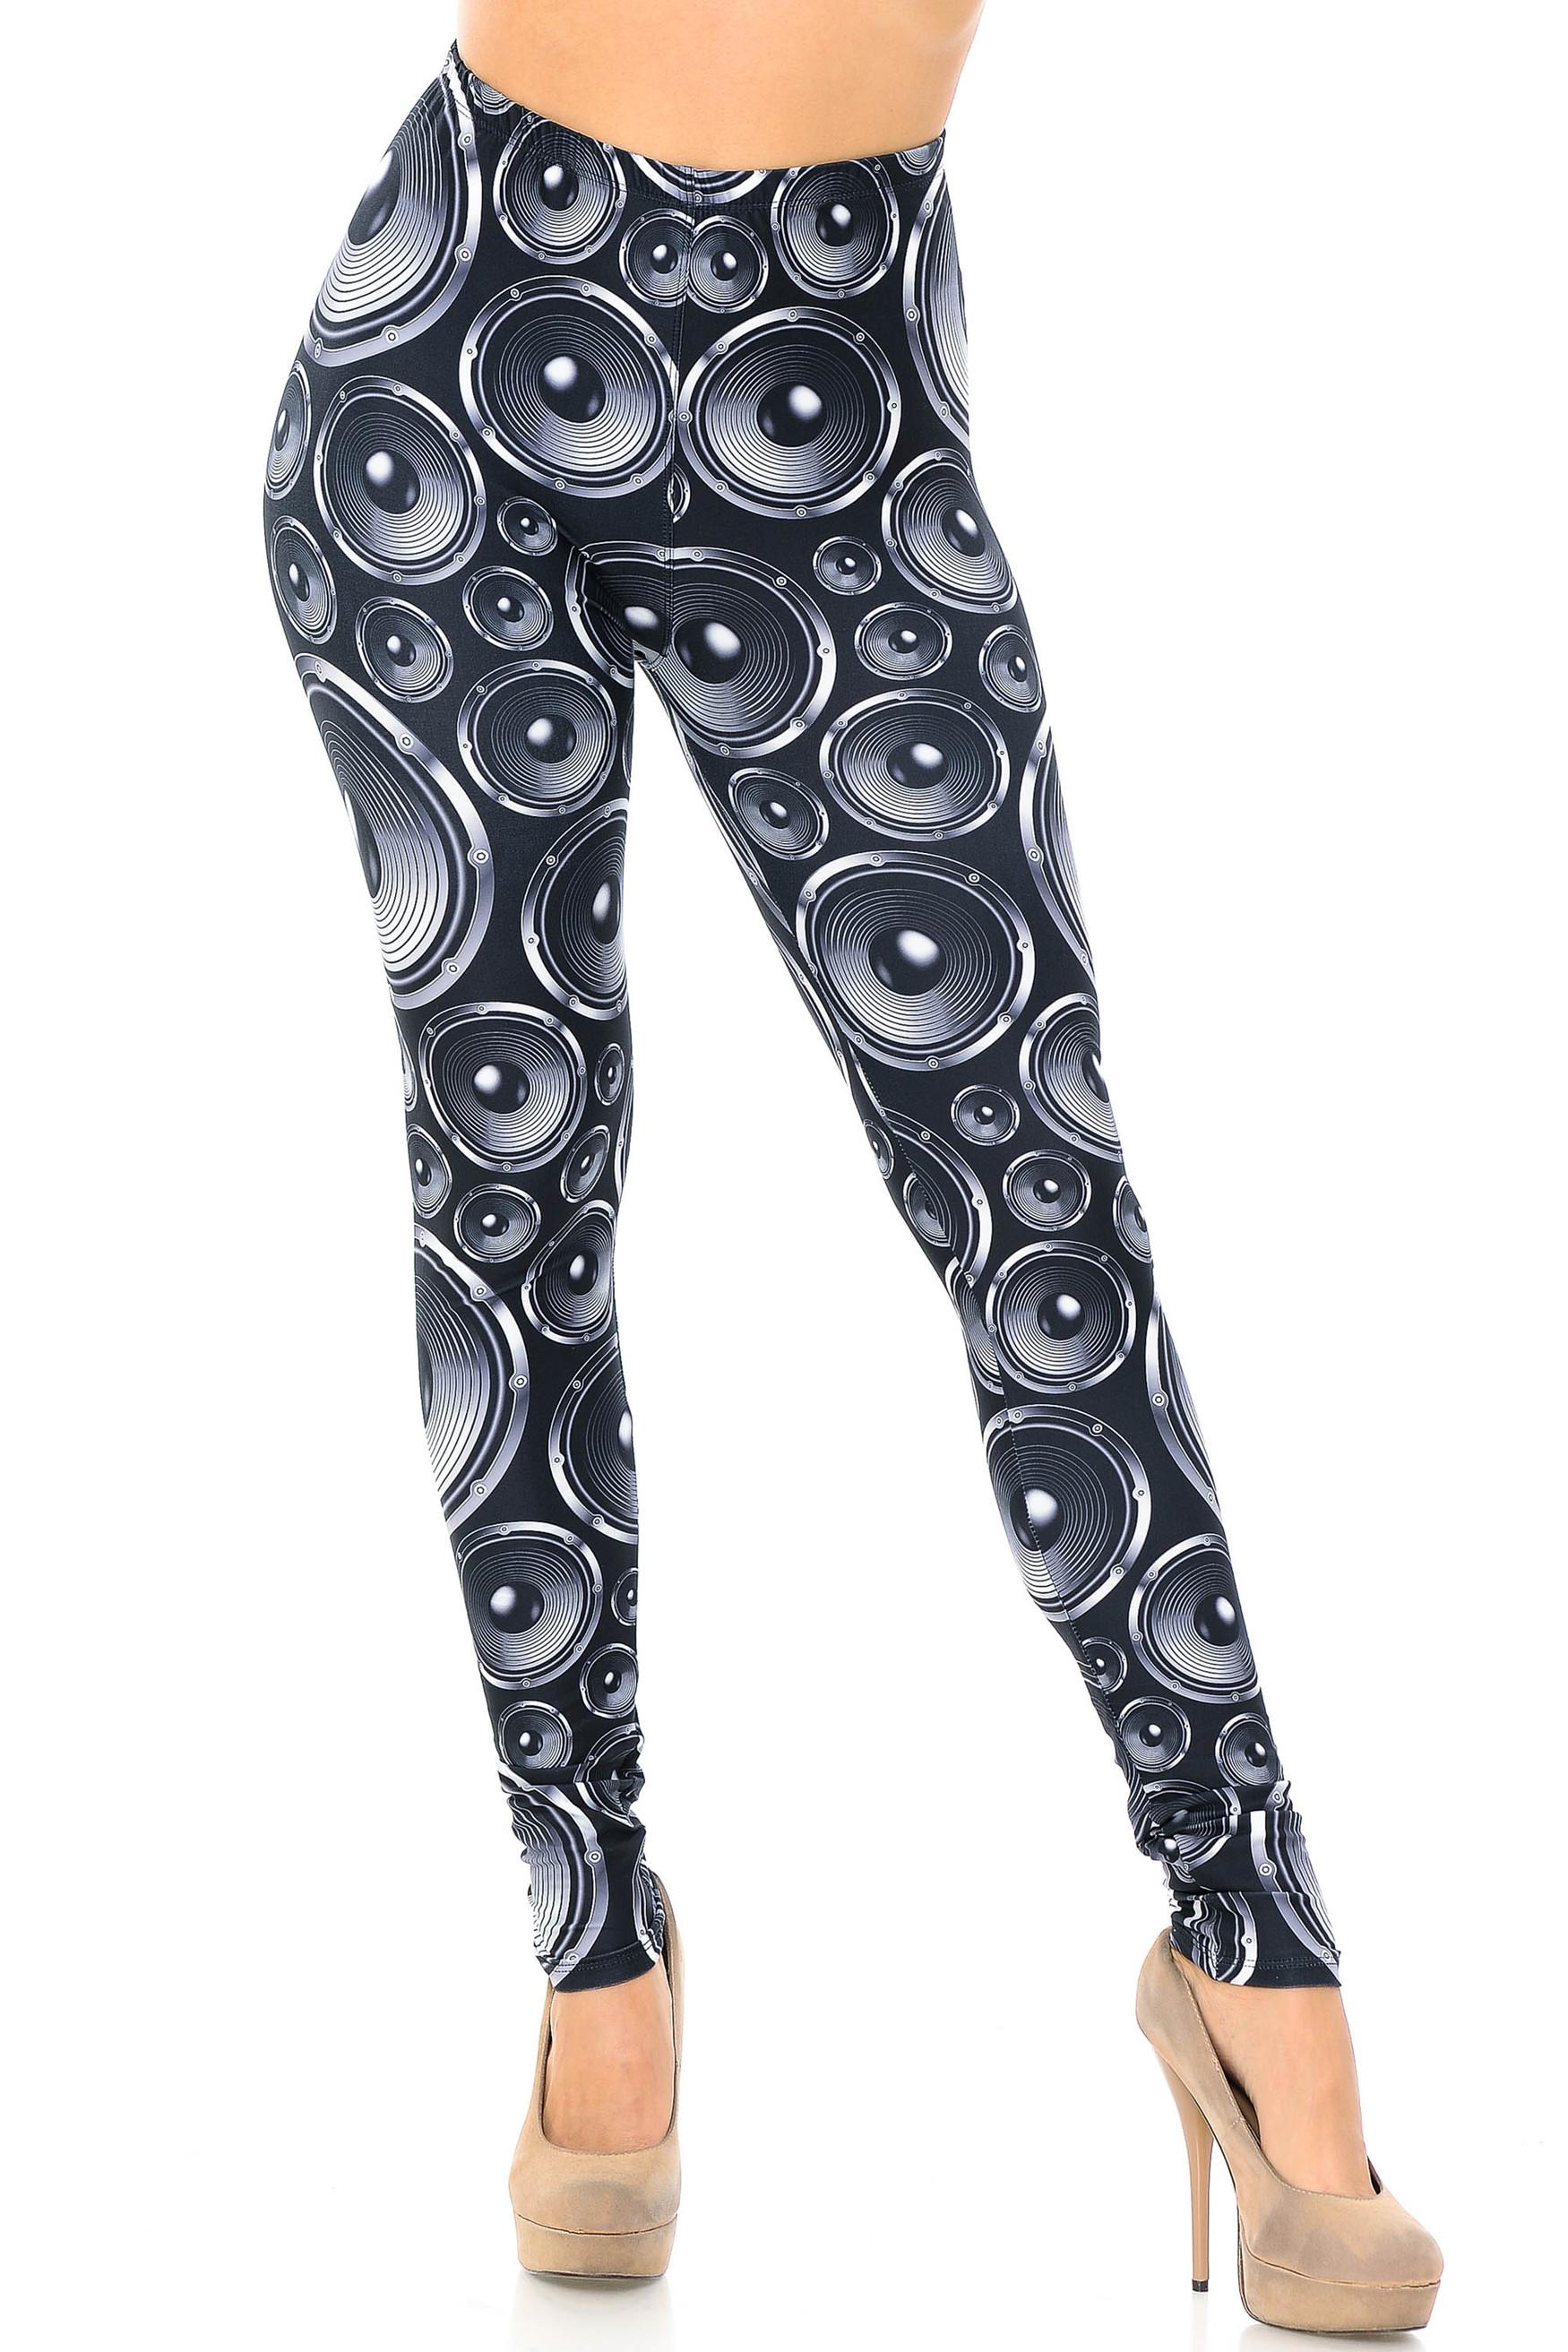 Creamy Soft Speaker Plus Size Leggings - USA Fashion™